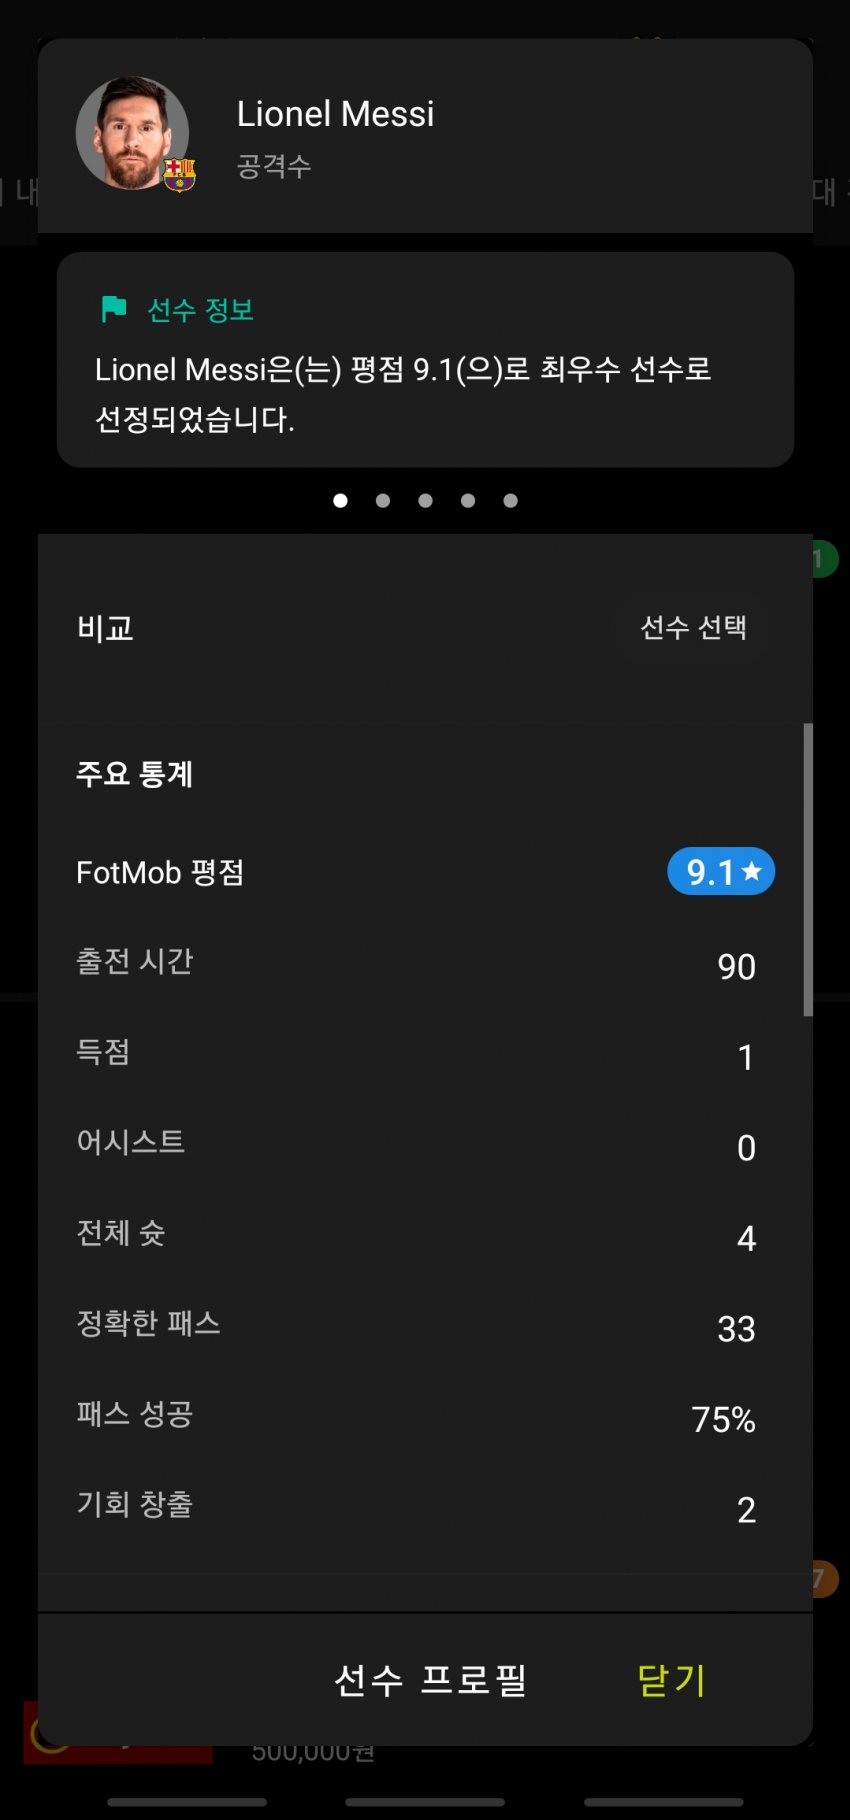 viewimage.php?id=2bb2df32e7d334aa51b1d3a240&no=24b0d769e1d32ca73cec82fa11d02831da48f5f7e7e334e6e7e5e9c8f8d462f85ac02086060b39744b98146f4a8442dc6a1c3663fc9c7518846327eec47b7db4270d12341468725bf869e214a764f2781b22d0884e7fbb6aff2e5898c933c4e1bb590dbb